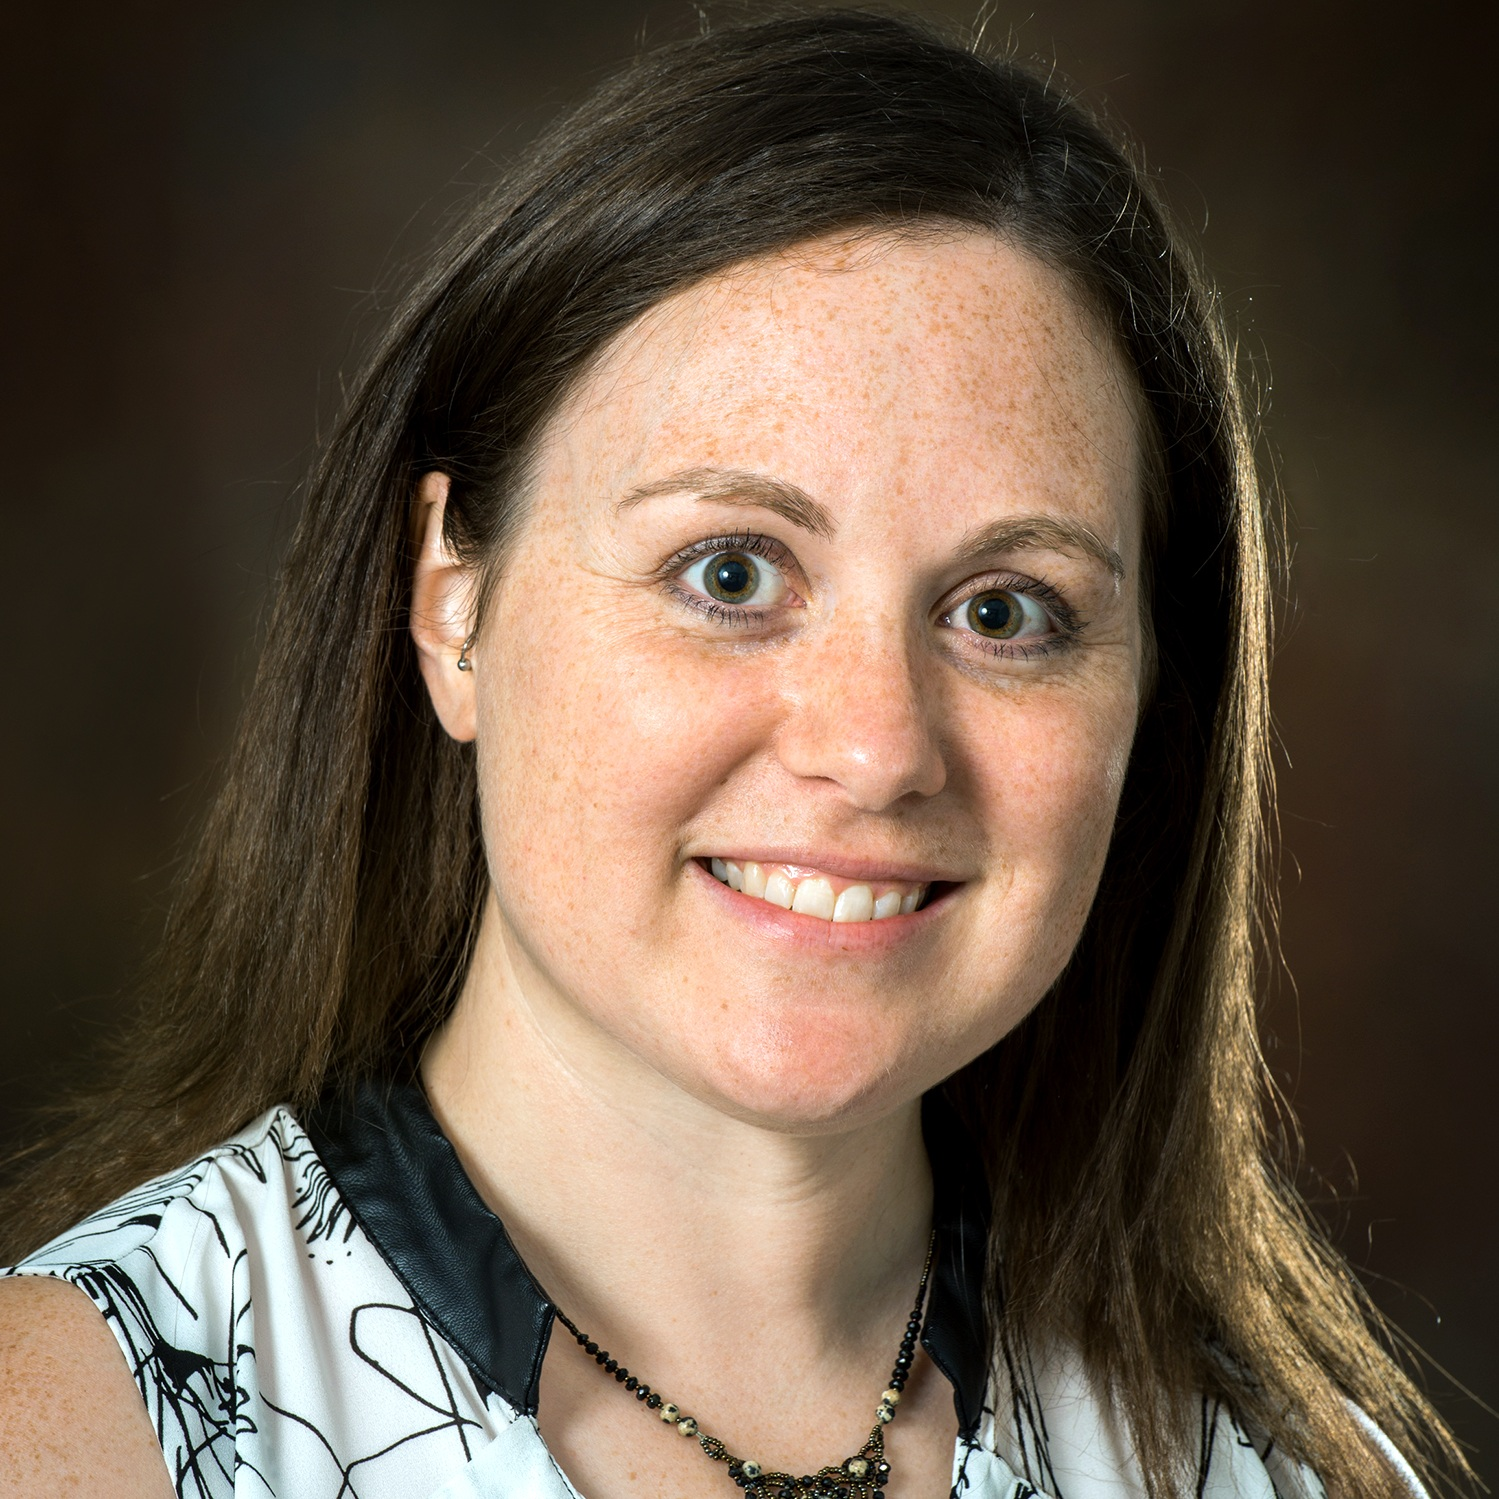 Lindsey Schneider, DVM - Resident, Dentistry & Oral Surgery, Cornell University College of Veterinary Medicine